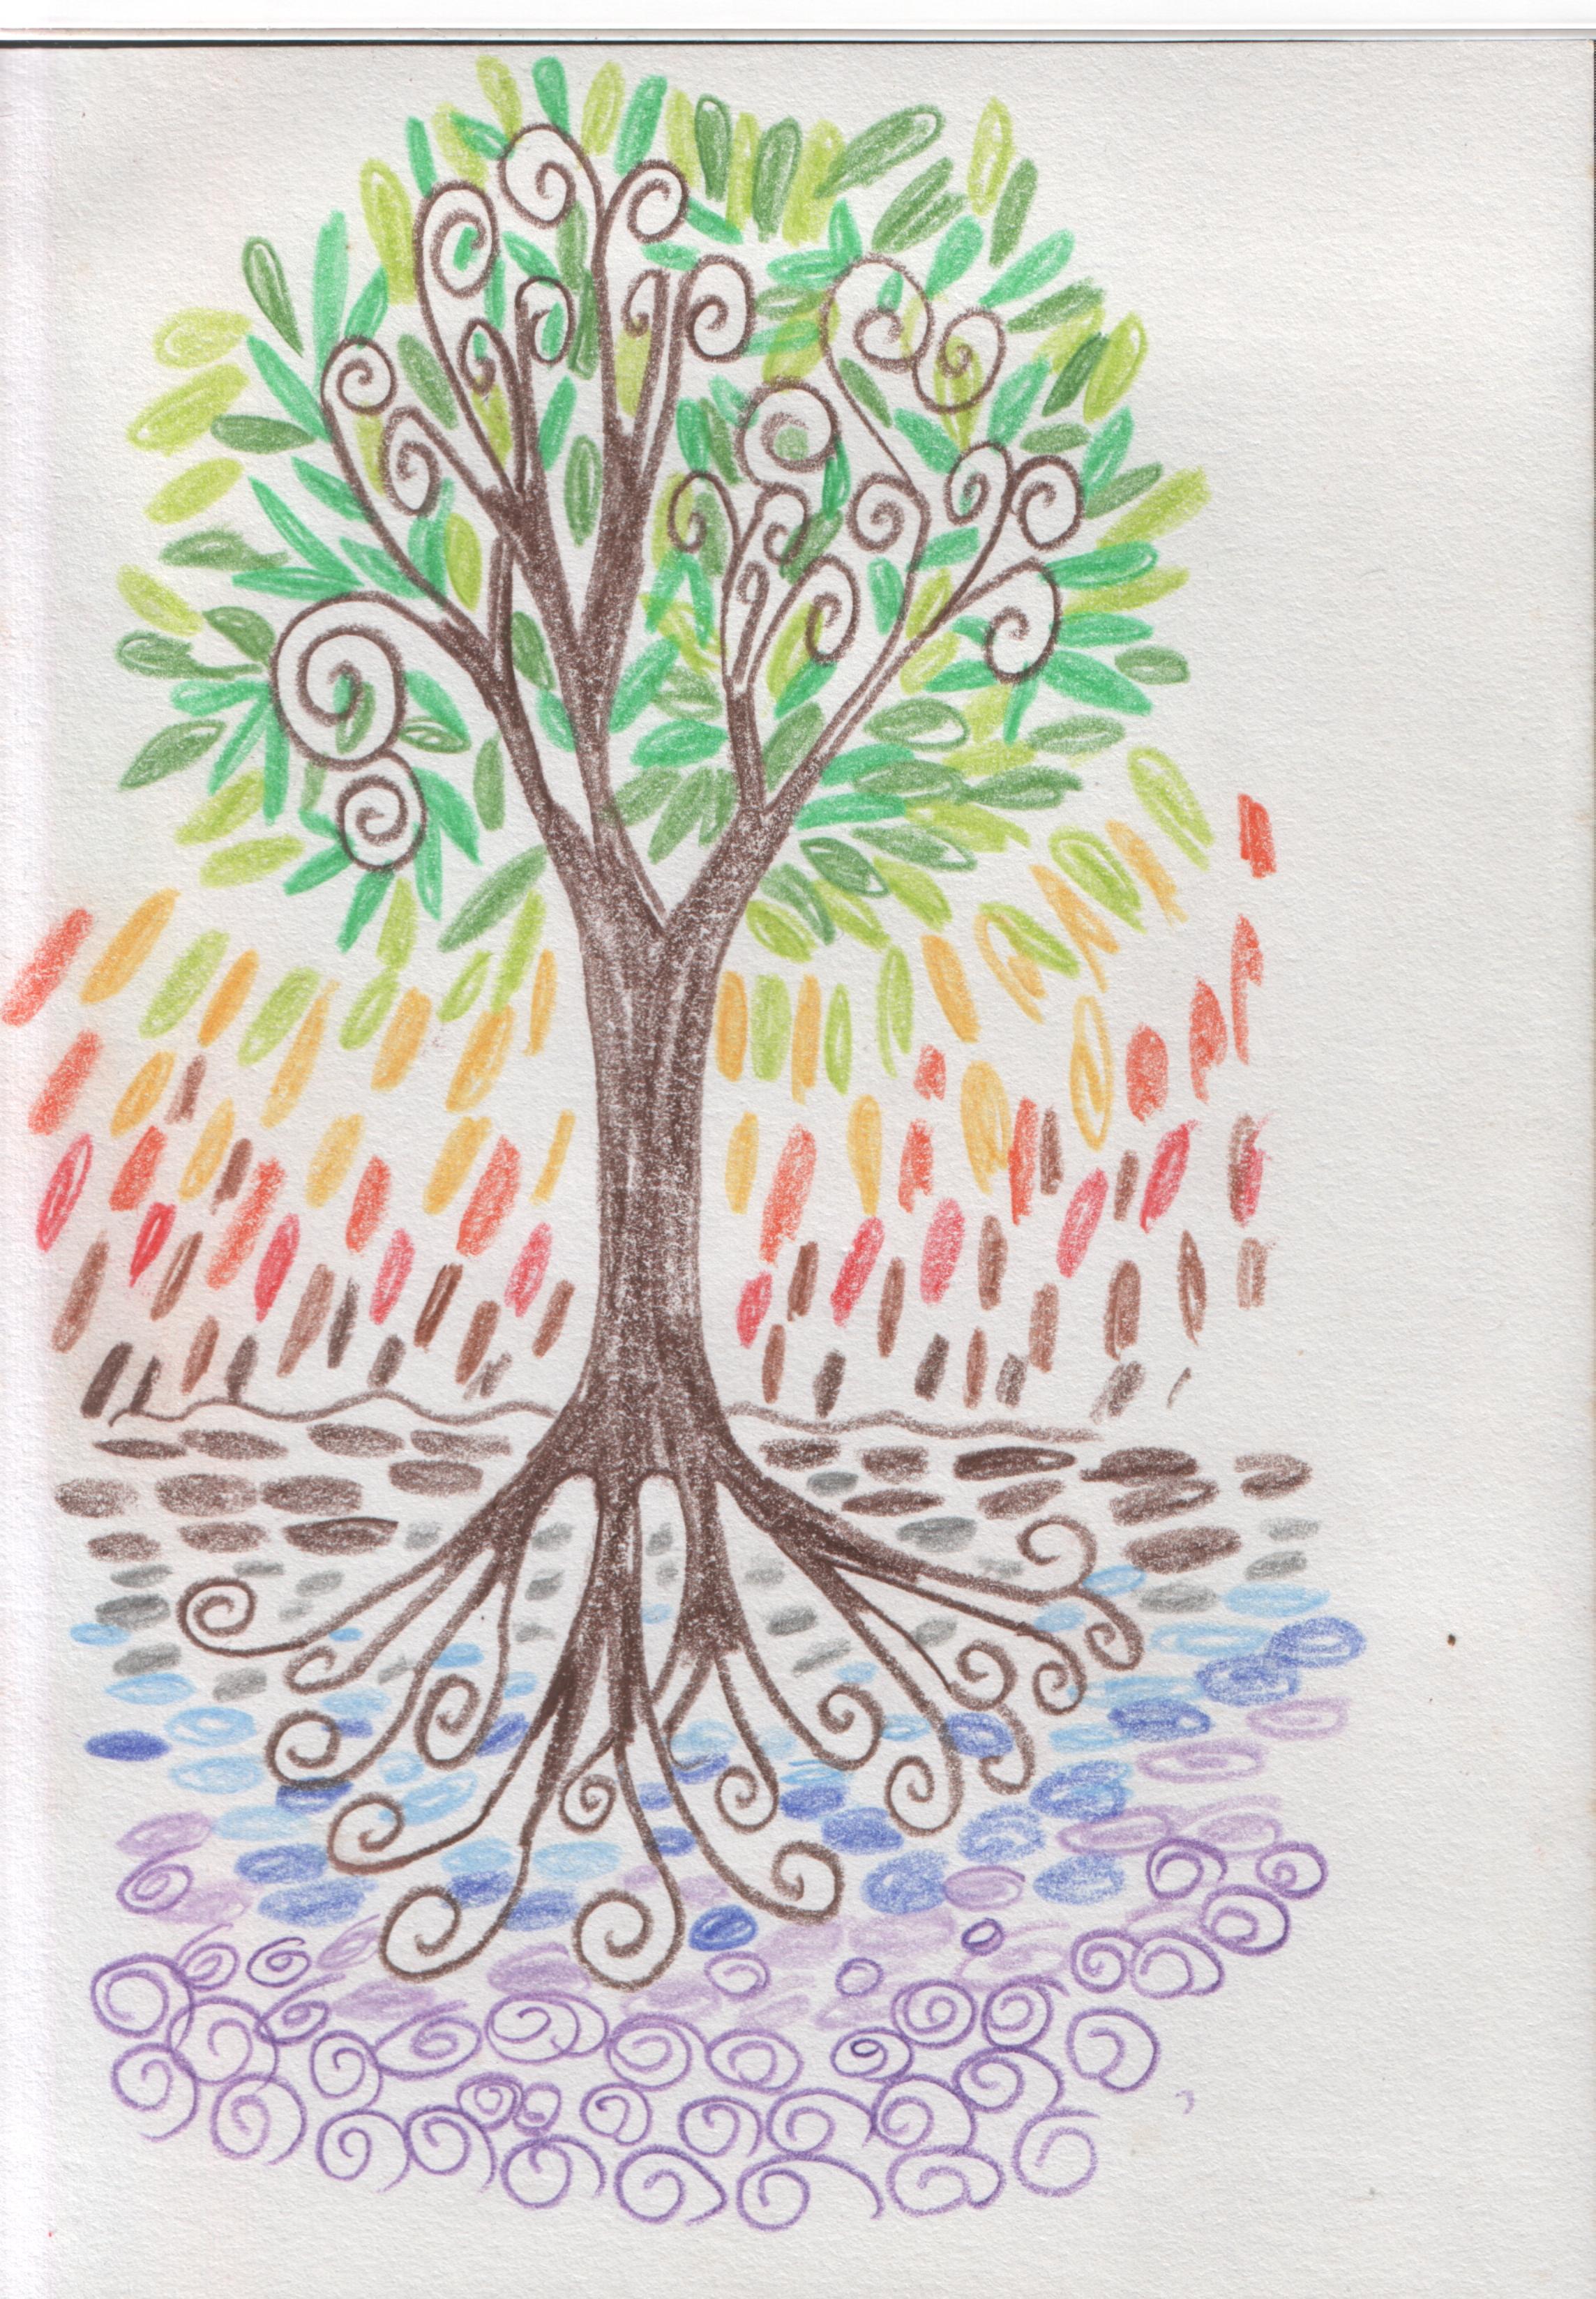 vivs-drawings-and-paintings-031